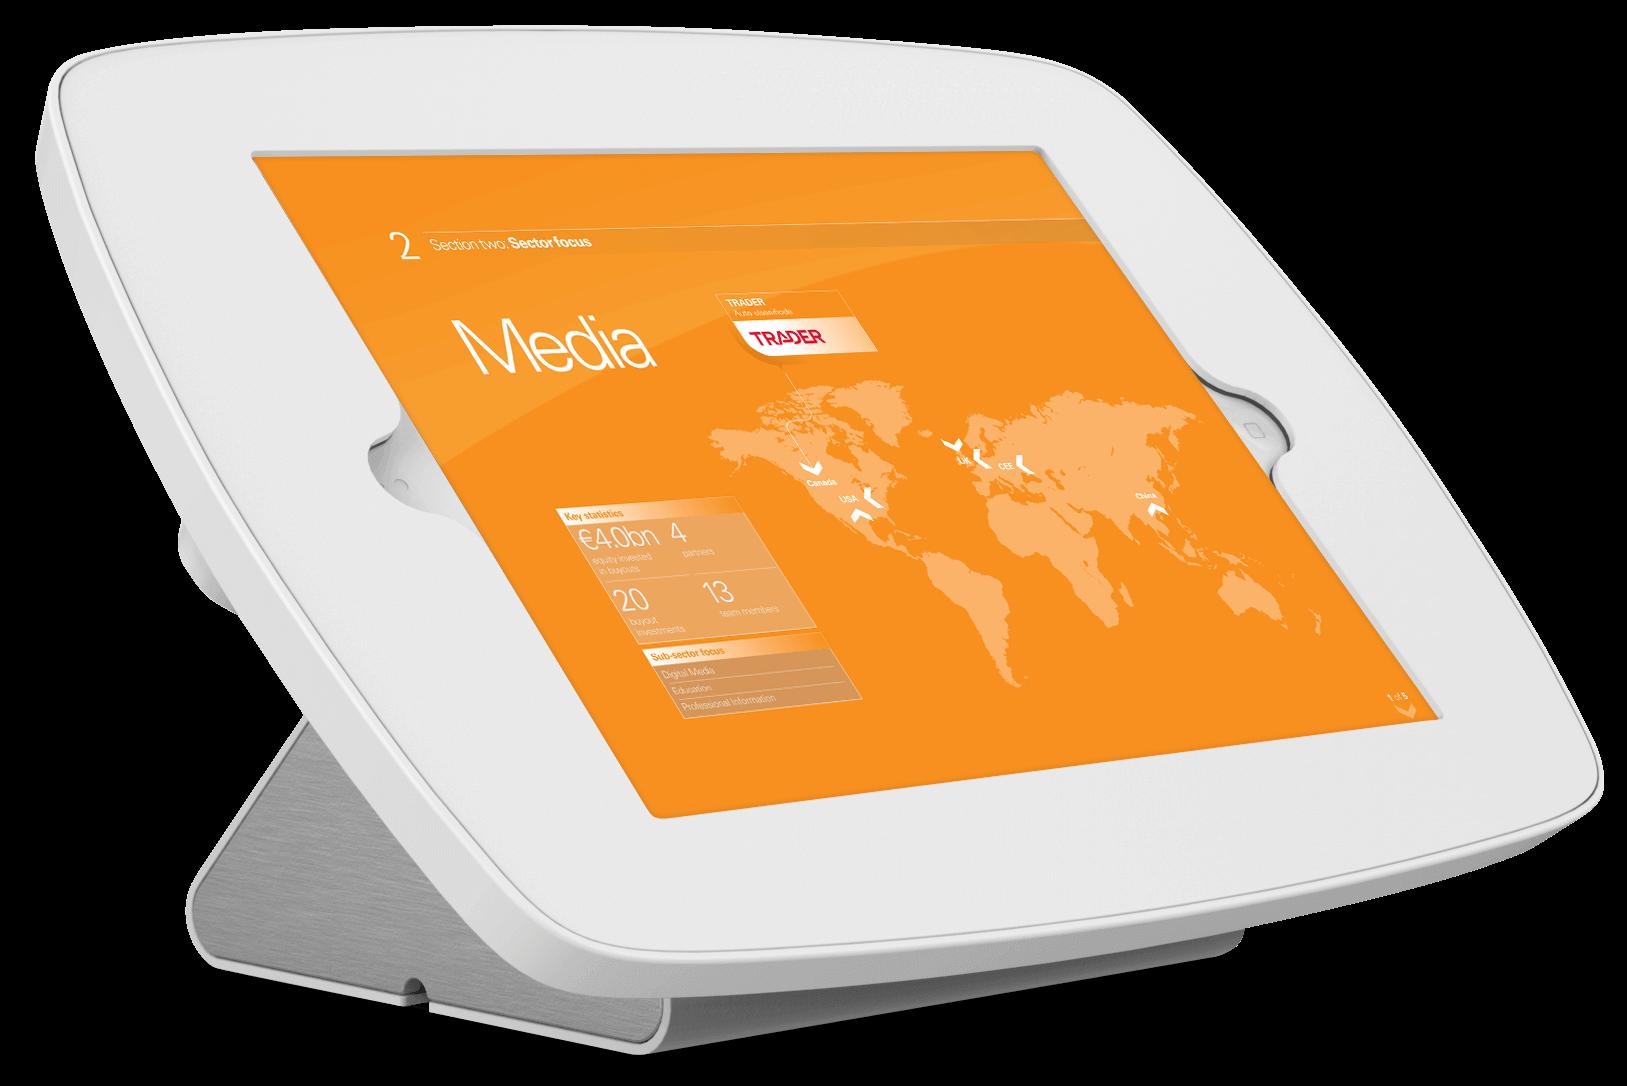 iPad Kiosk Application Development | Kiosk Design Agency